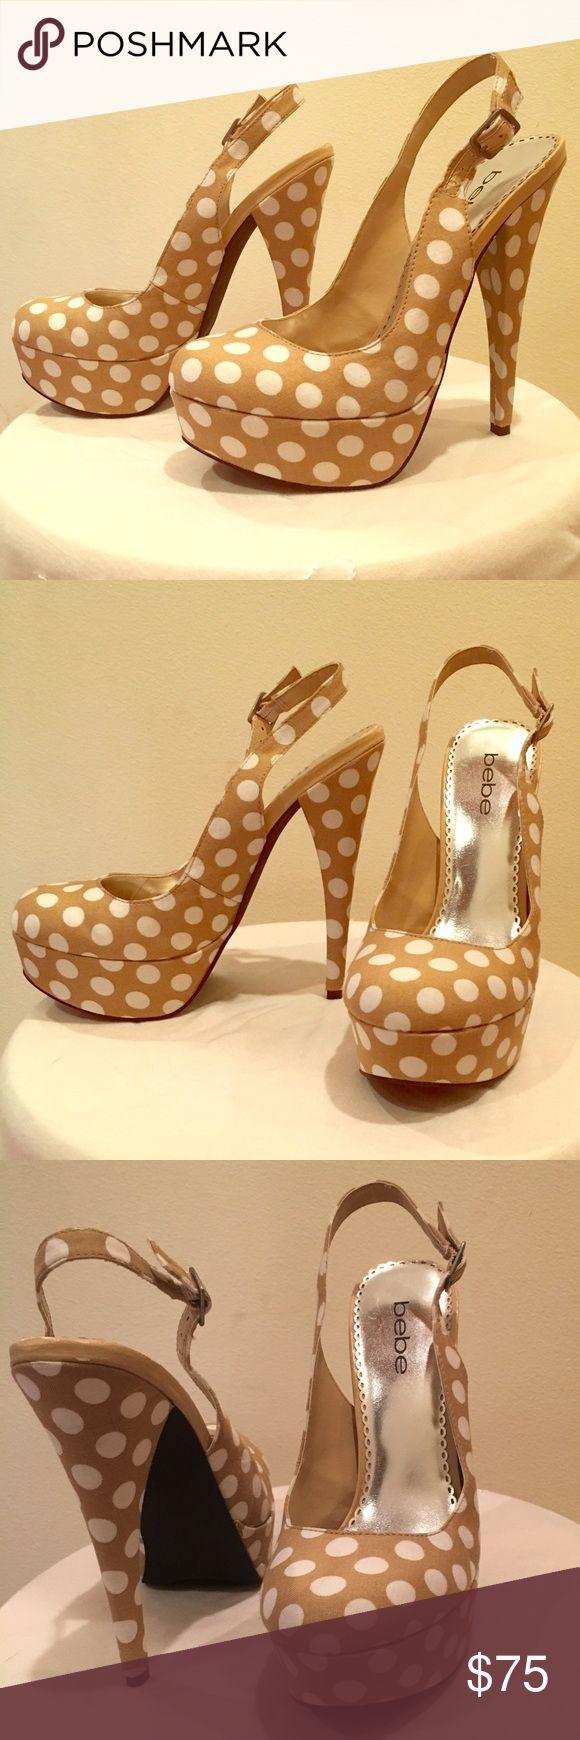 Spotted while shopping on Poshmark: bebe polka dot sling back pumps! #poshmark #fashion #shopping #style #bebe #Shoes